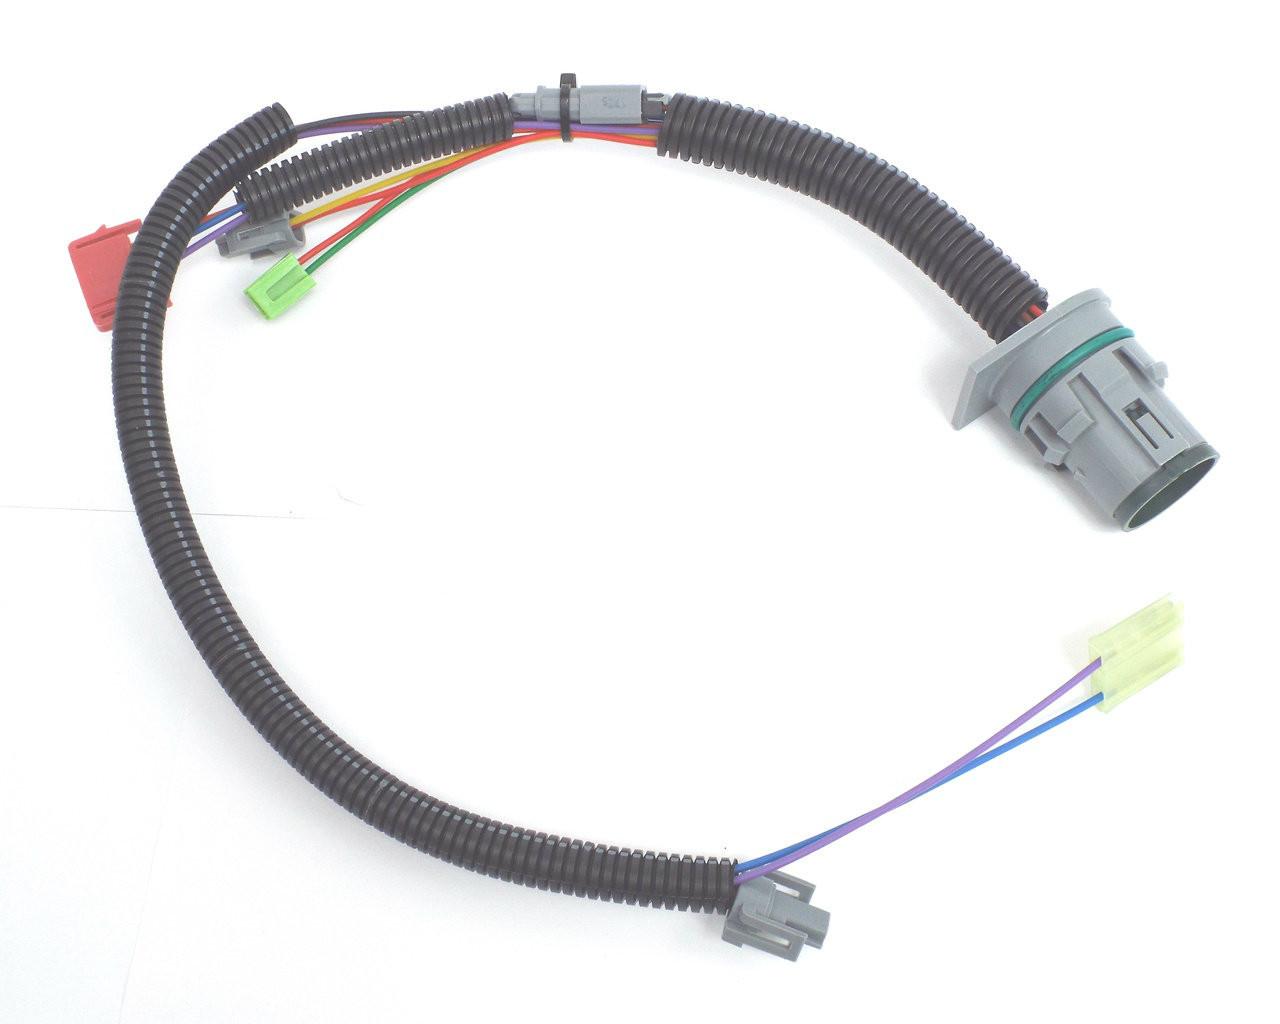 small resolution of new 4l80e transmission hd internal valve body wiring harness 1991 2003 4l80e internal wiring harness diagram 4l80e internal wiring harness